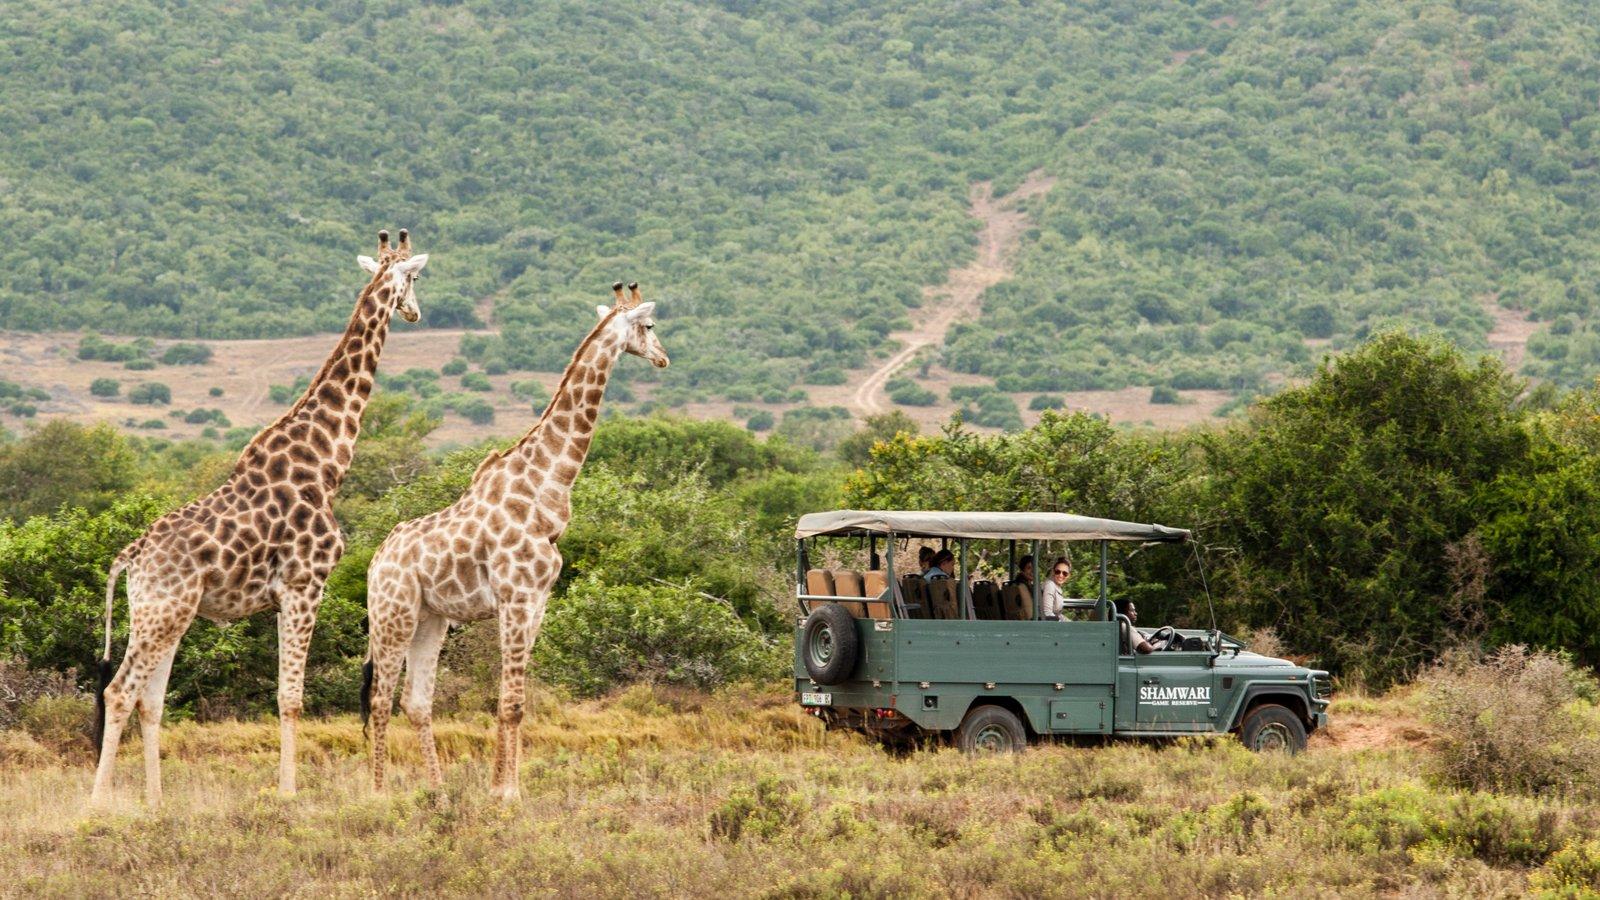 Johannesburg - Gauteng featuring land animals, tranquil scenes and safari adventures